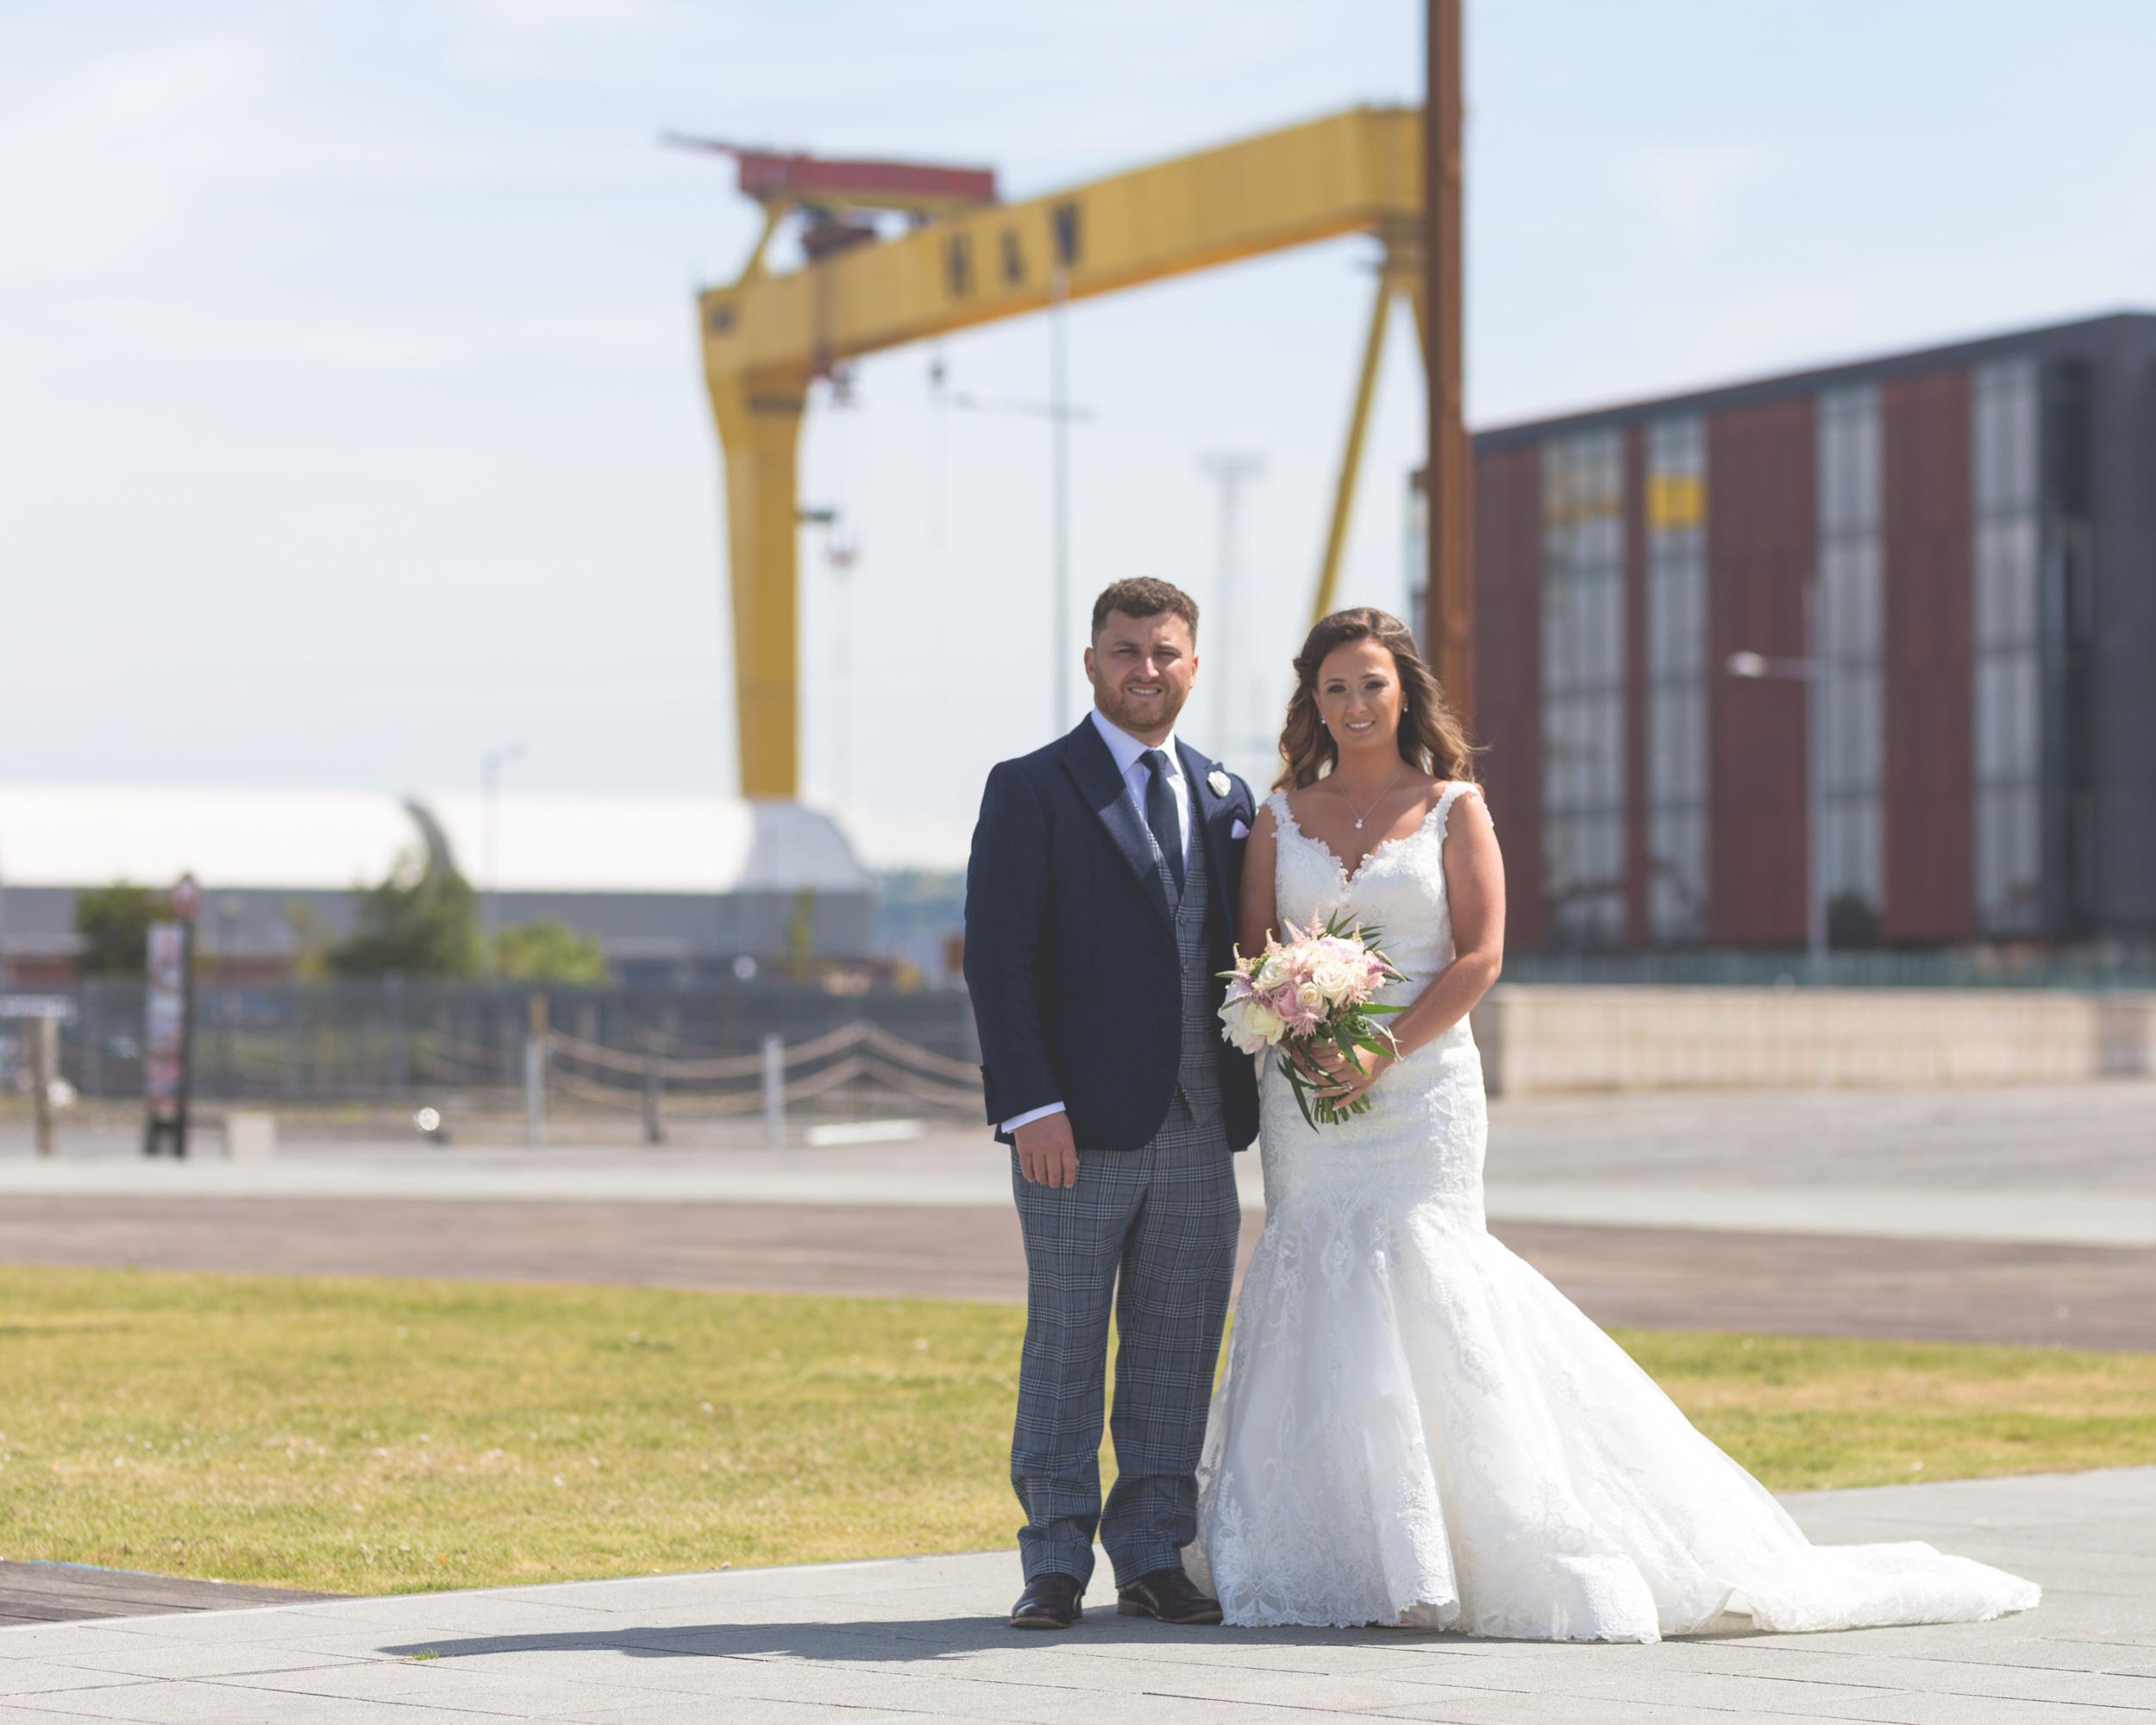 Brian McEwan   Northern Ireland Wedding Photographer   Rebecca & Michael   Portraits-46.jpg